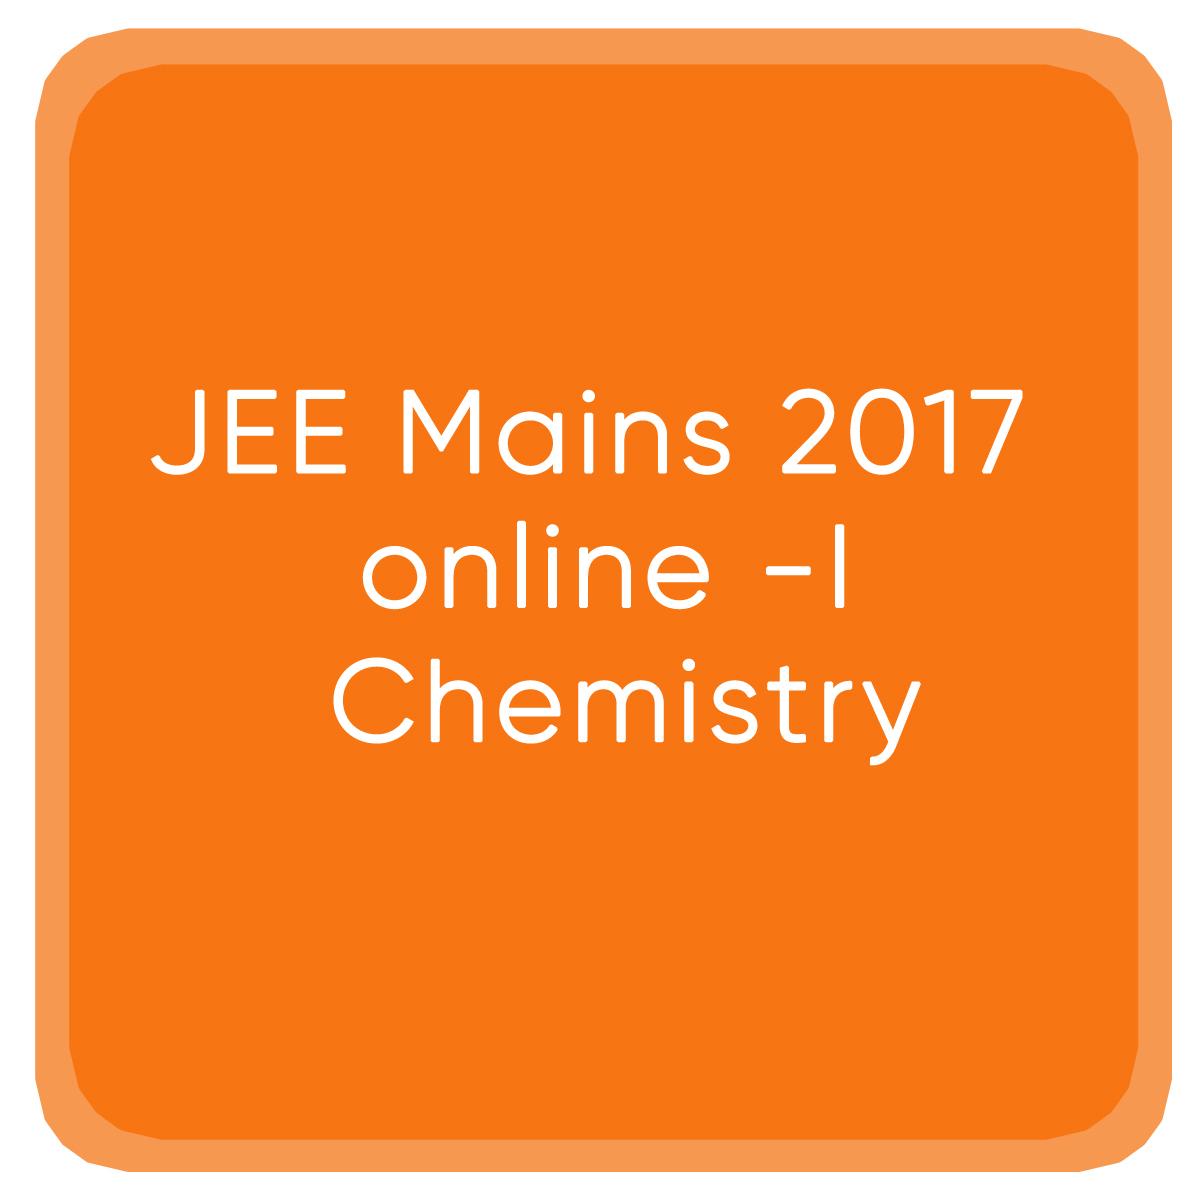 JEE Mains 2017 online -I Chemistry